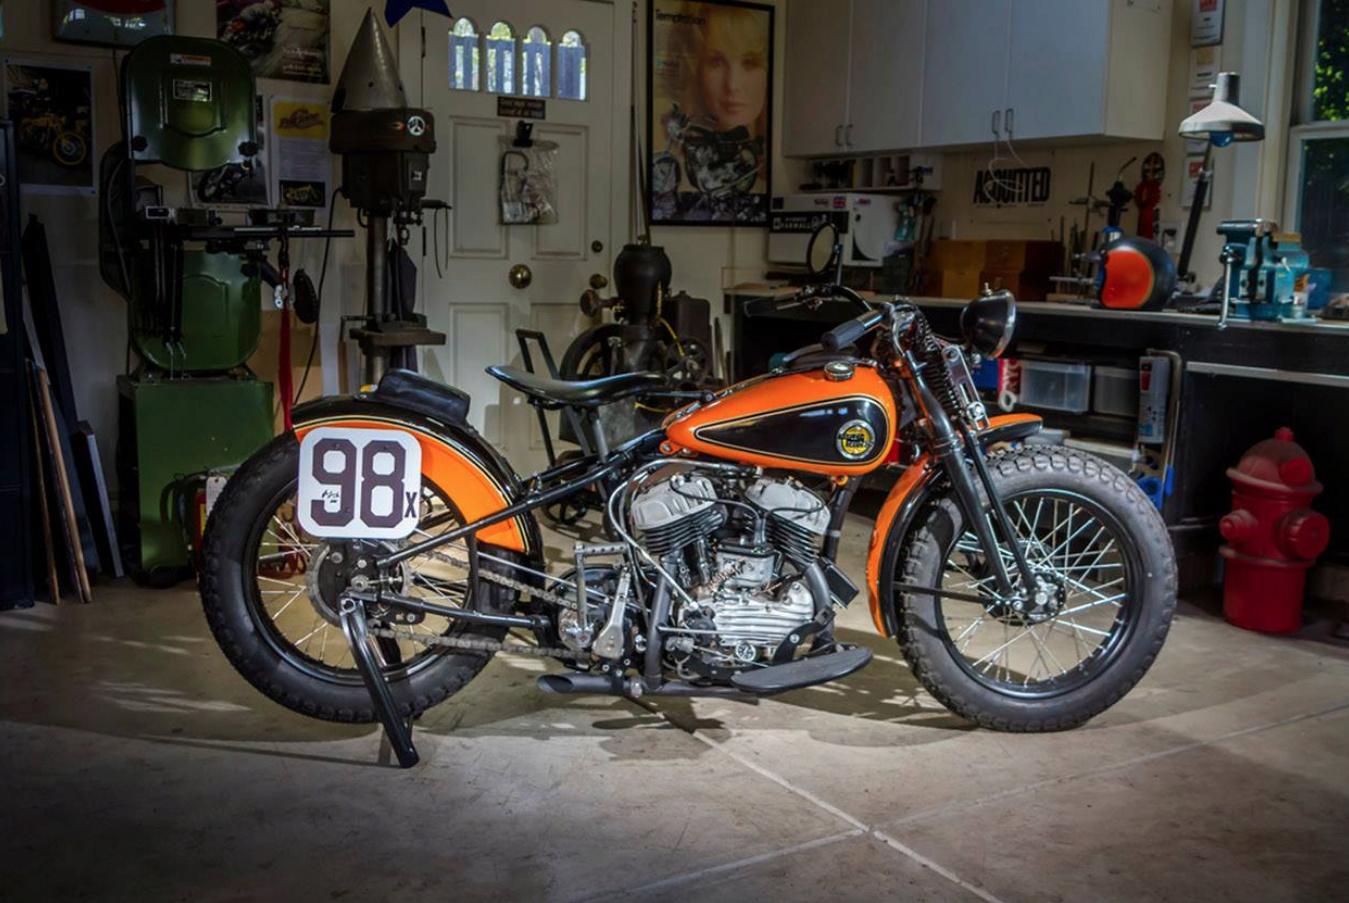 Harley de course - Page 17 Captu843